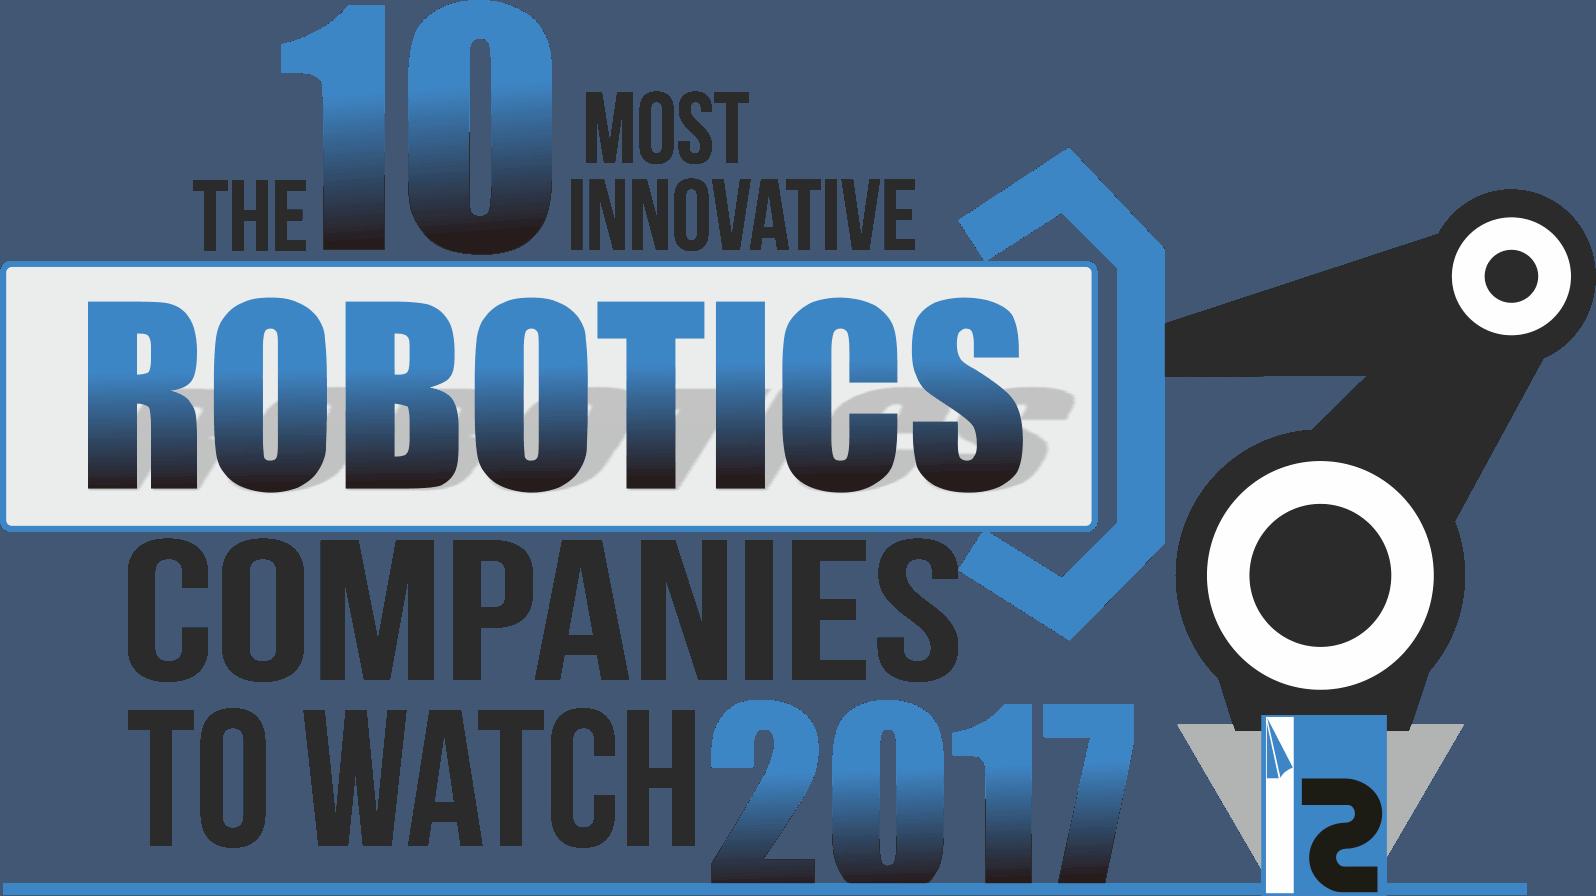 The 10 Most Innovative Robotics Companies to Watch 2017 logo